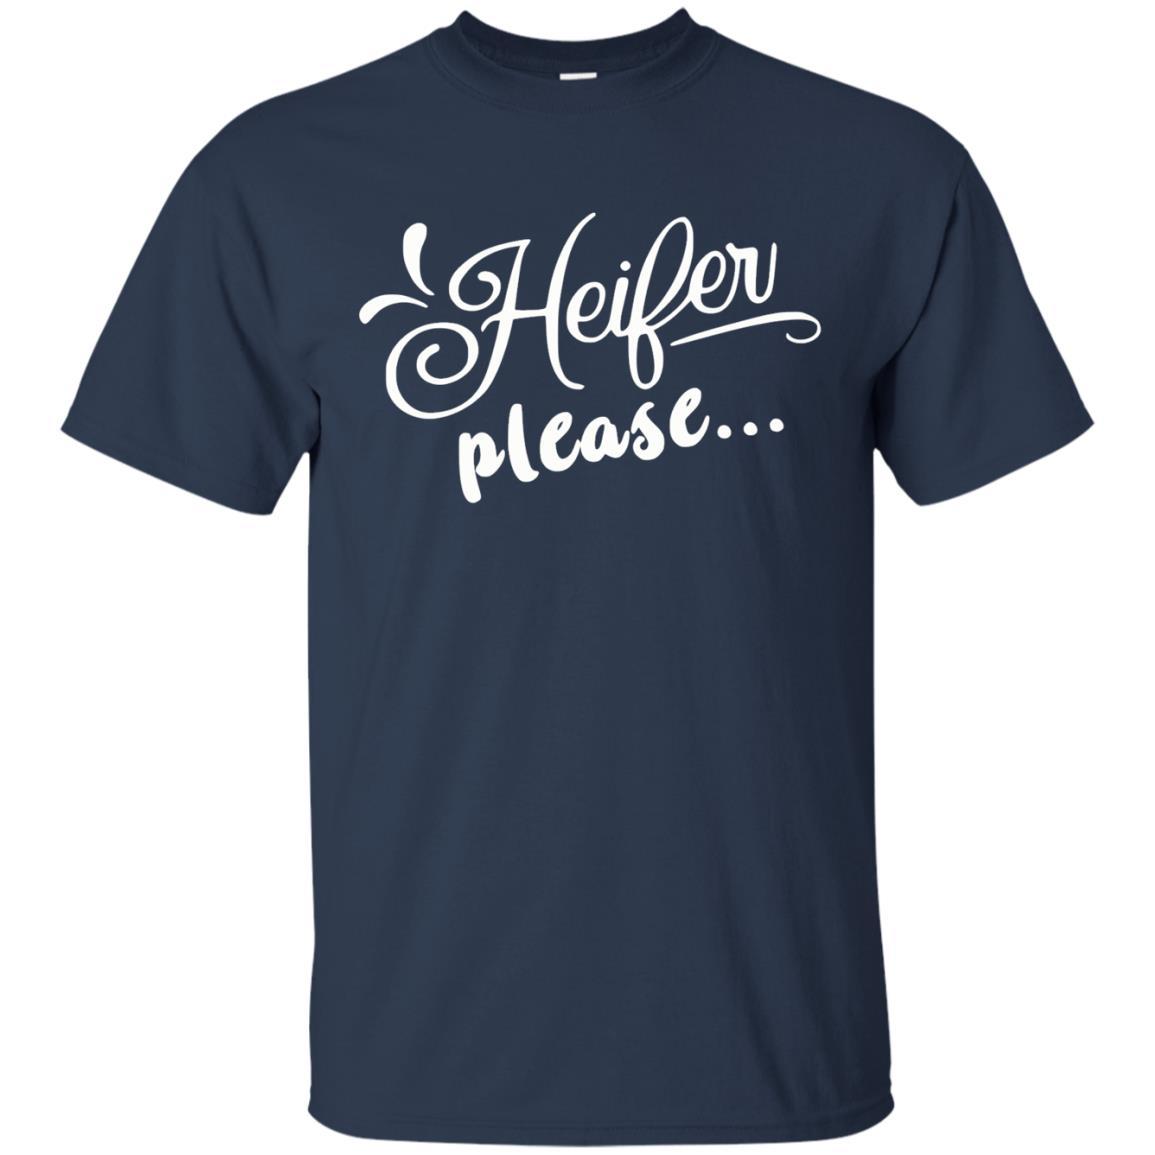 image 2145 - Heifer Please shirt, sweater: funny farmer apparel